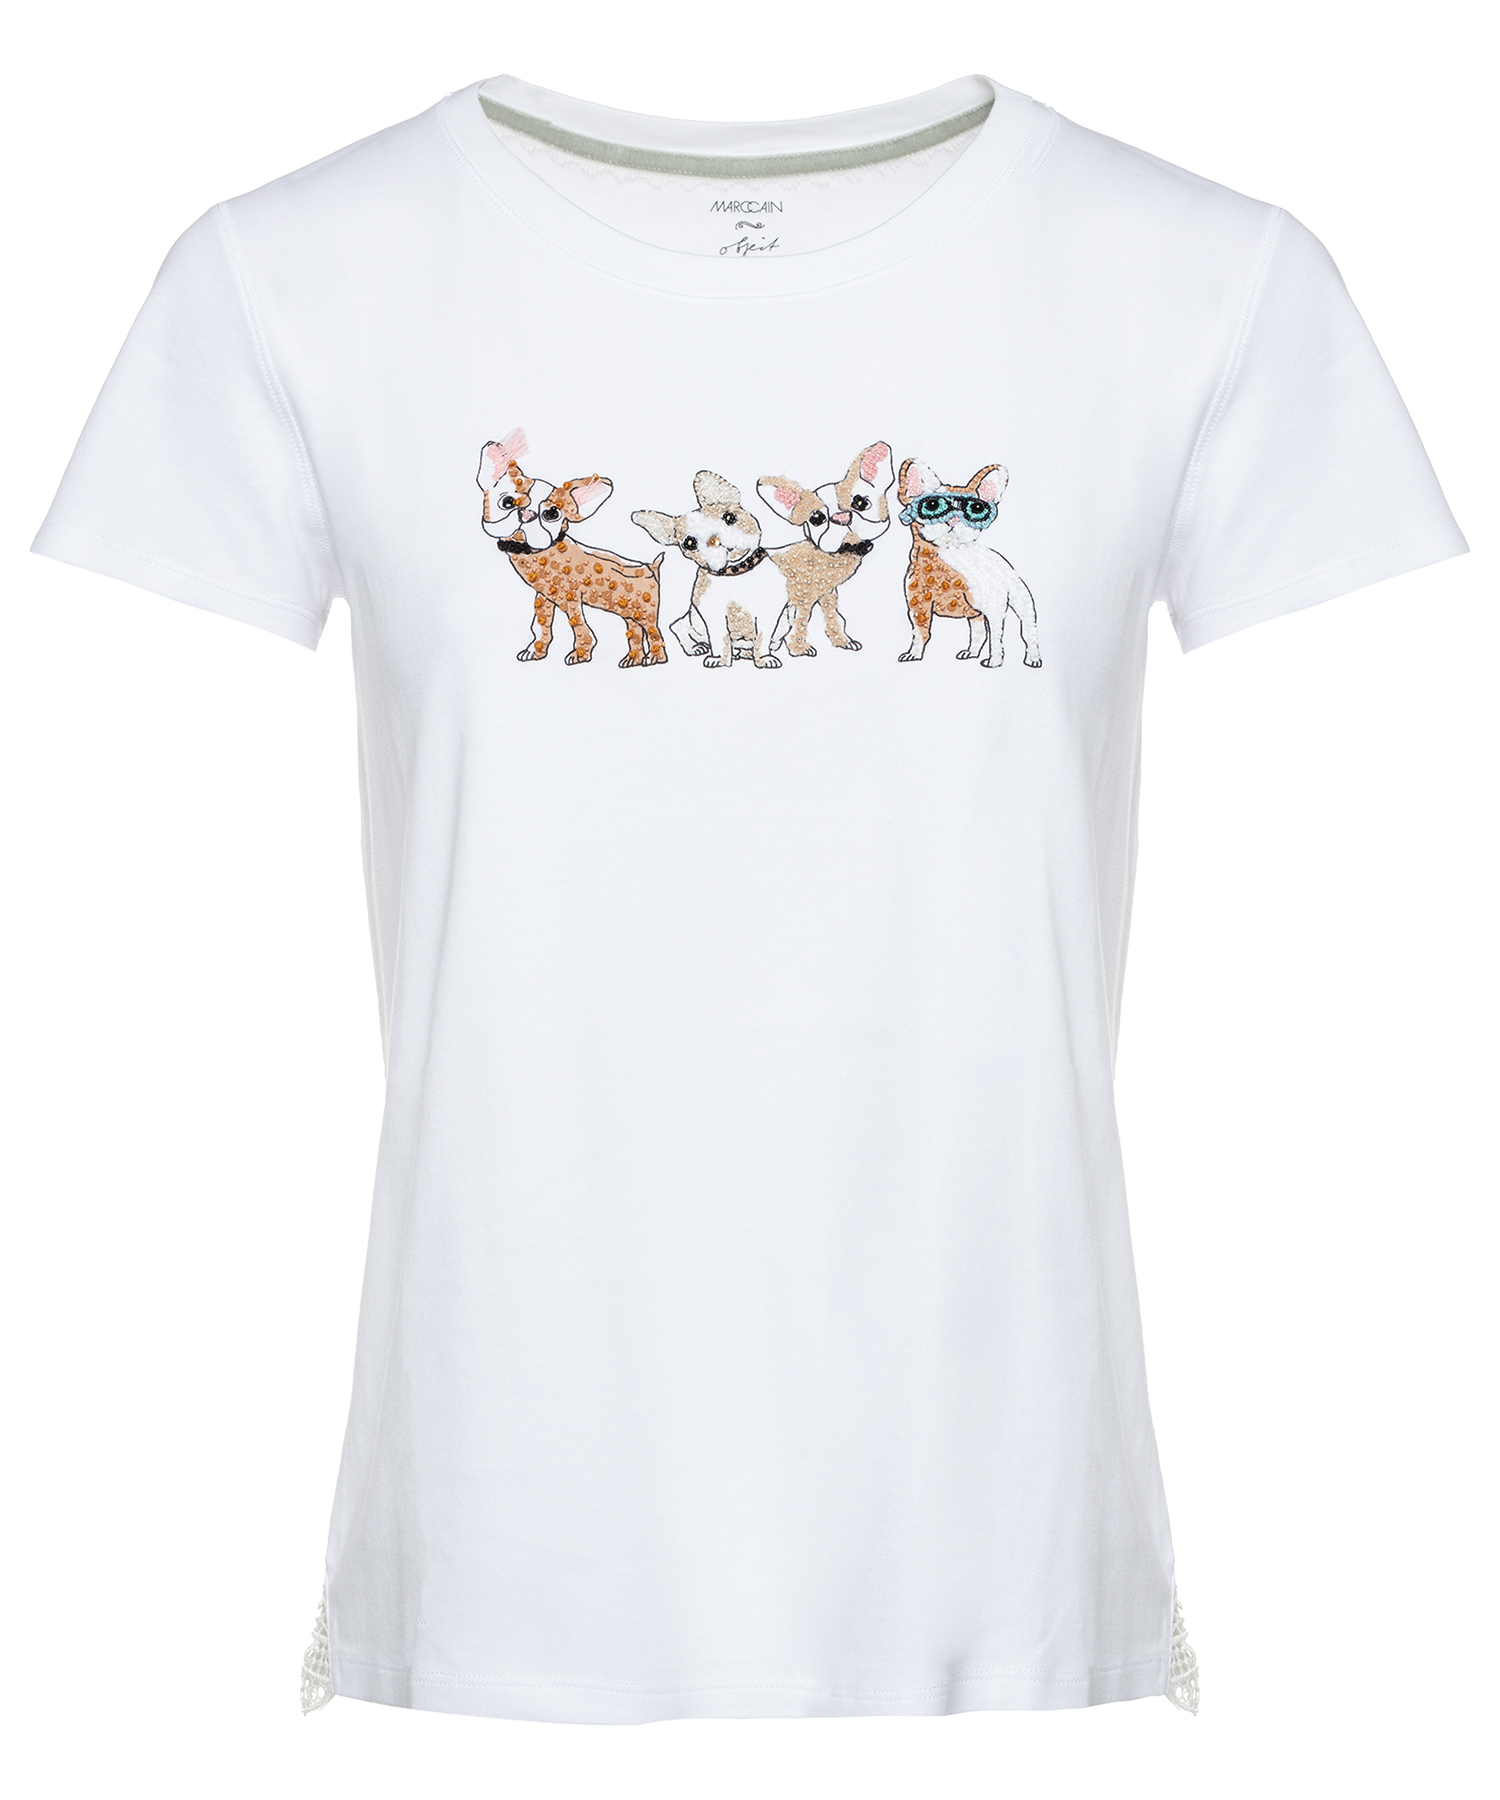 Marc Cain shirt met hondjes